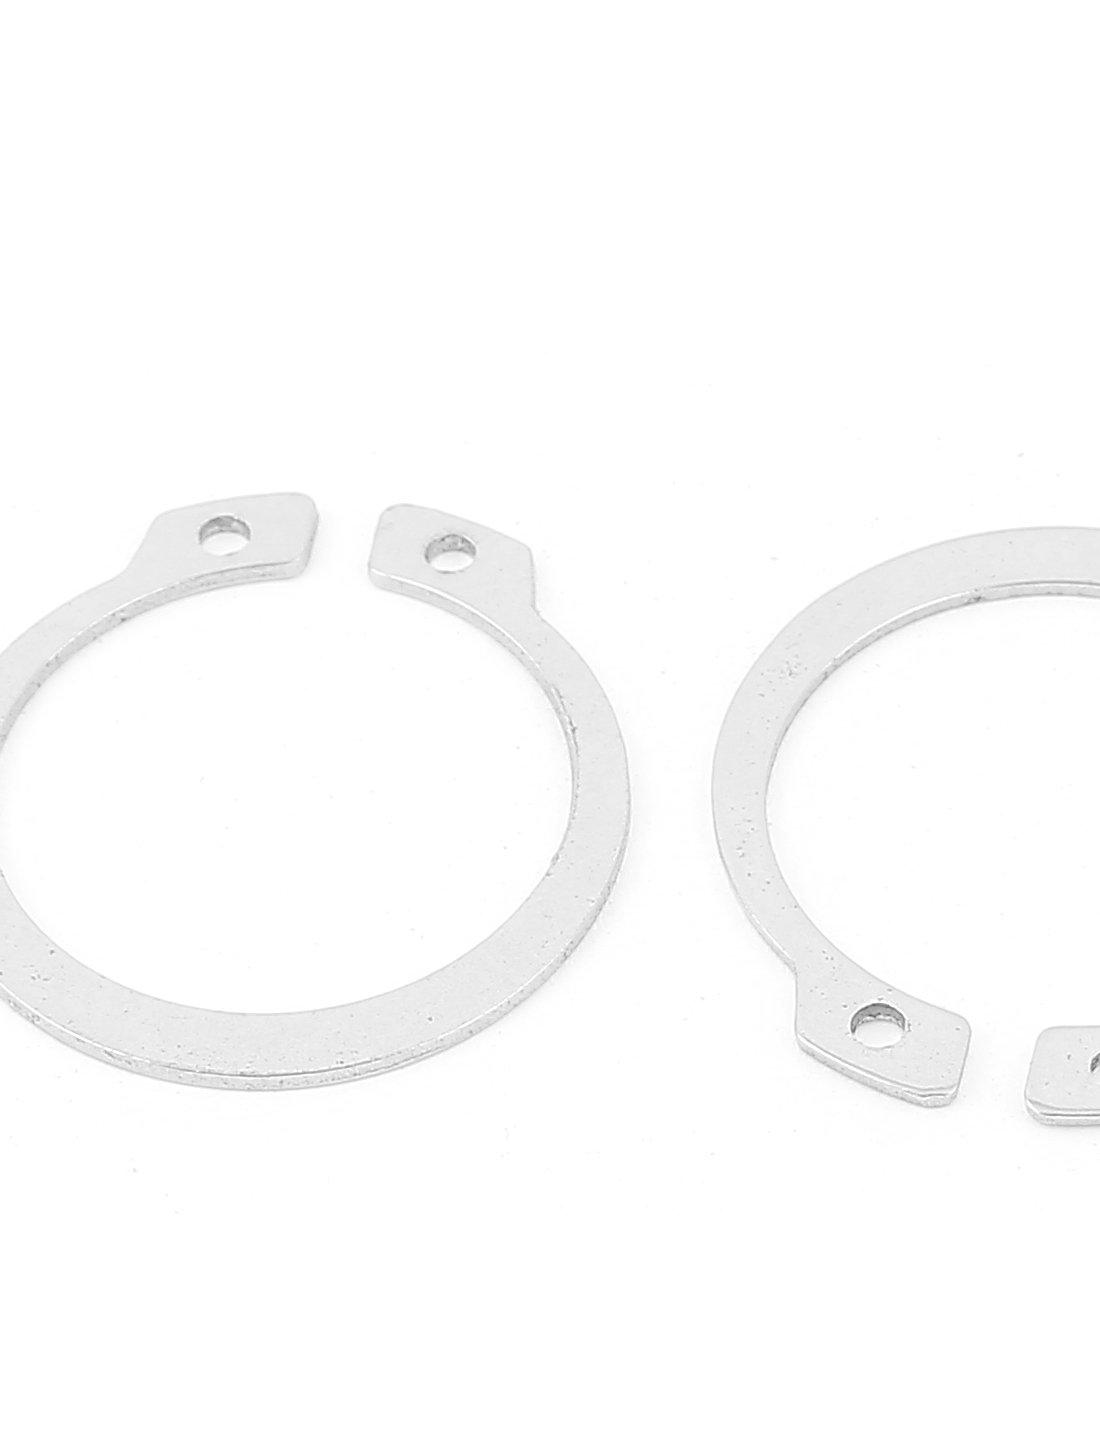 uxcell External Circlip Retaining Shaft Snap Clip Rings 30mm 10pcs